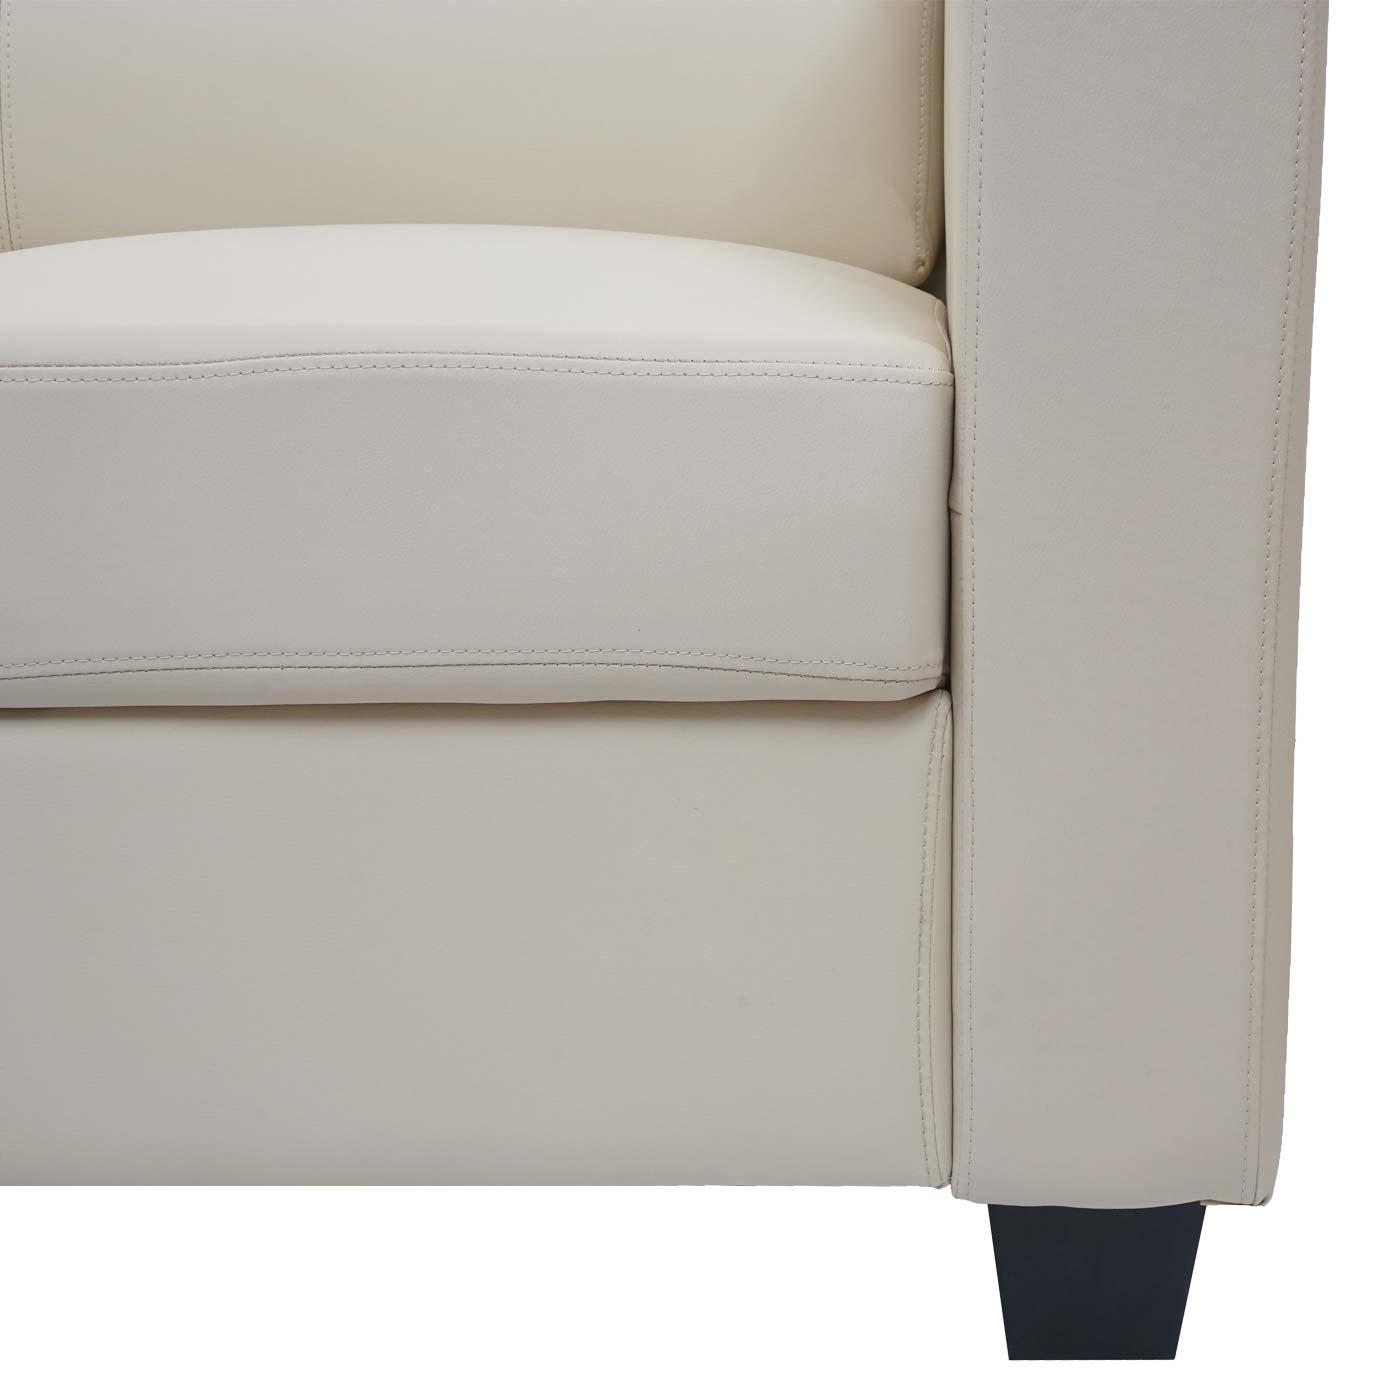 Sessel Loungesessel Lille Detailansicht Polsterung